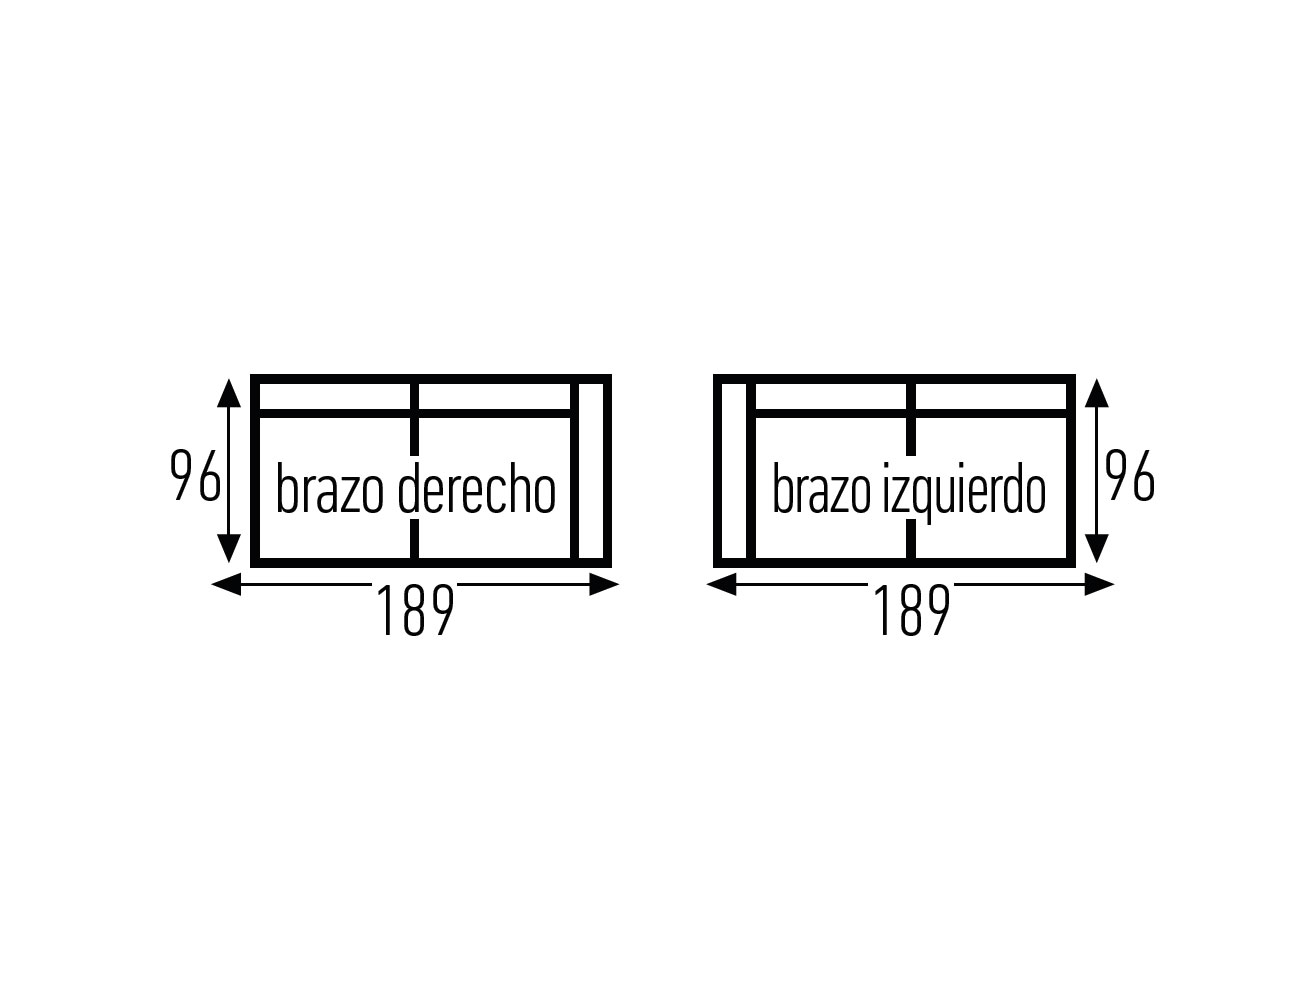 Croquis 3p sin 1 brazo 18917